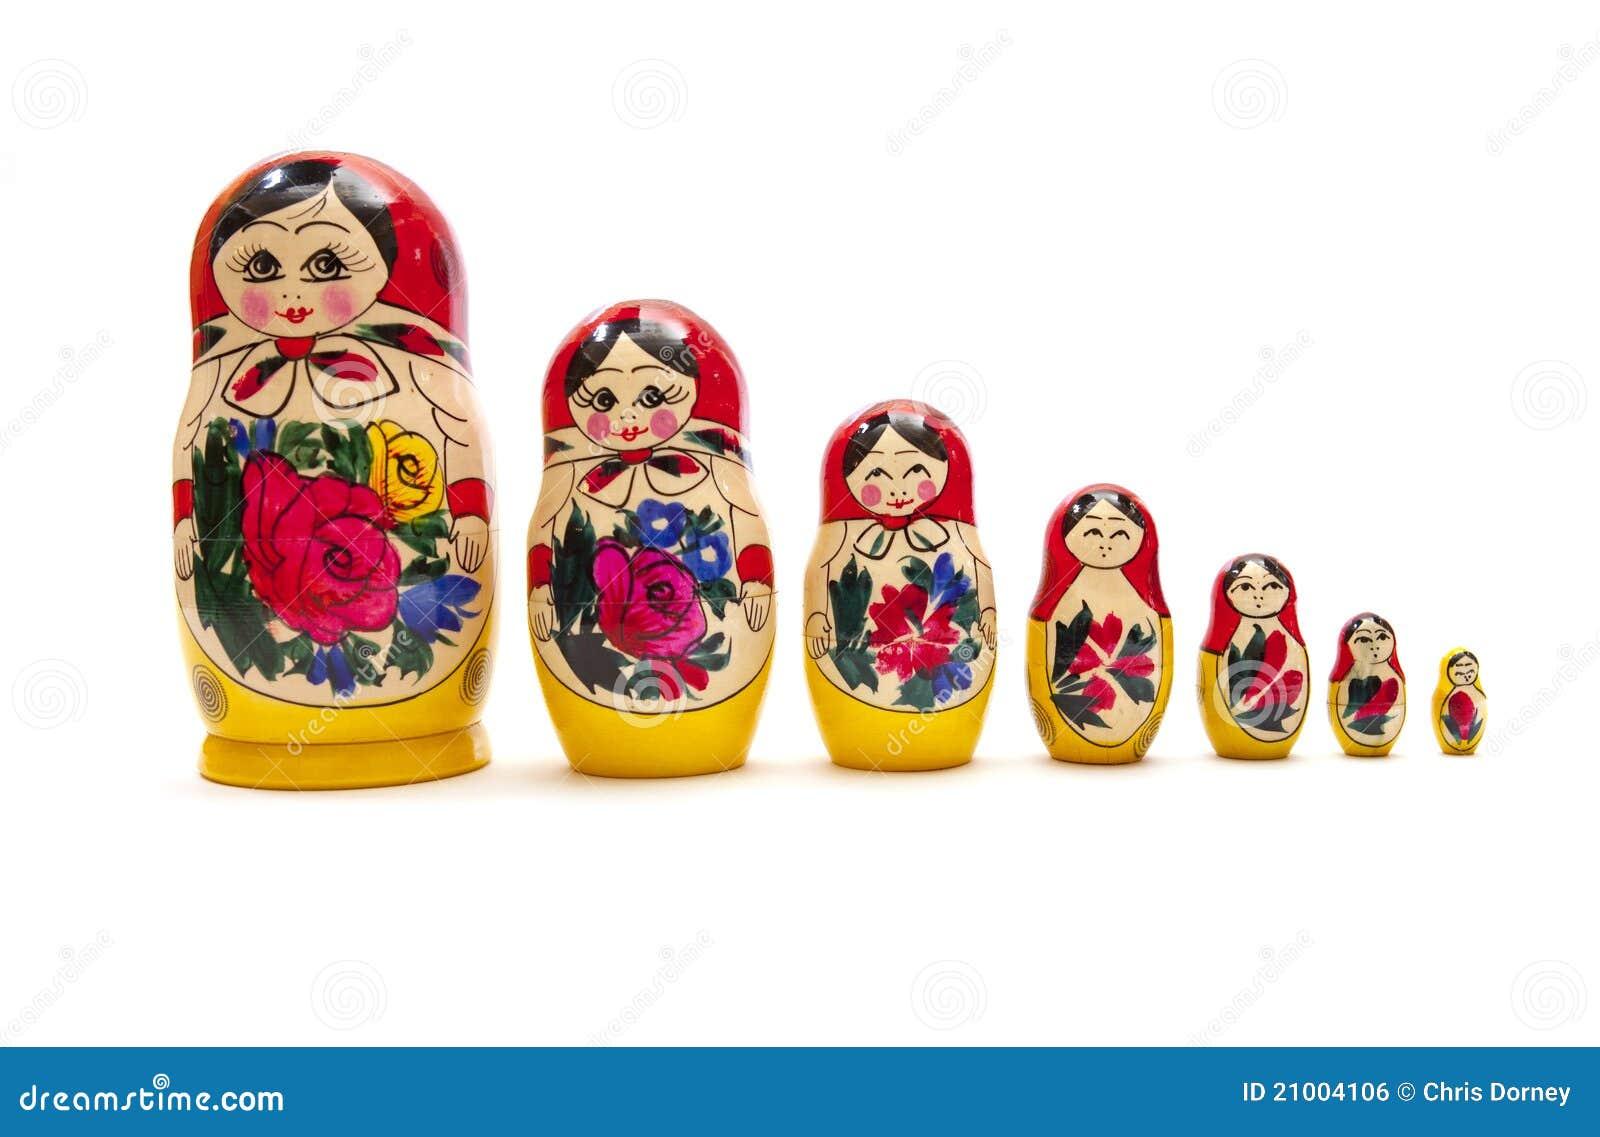 Download Russian Dolls stock photo. Image of perspective, petersburg - 21004106